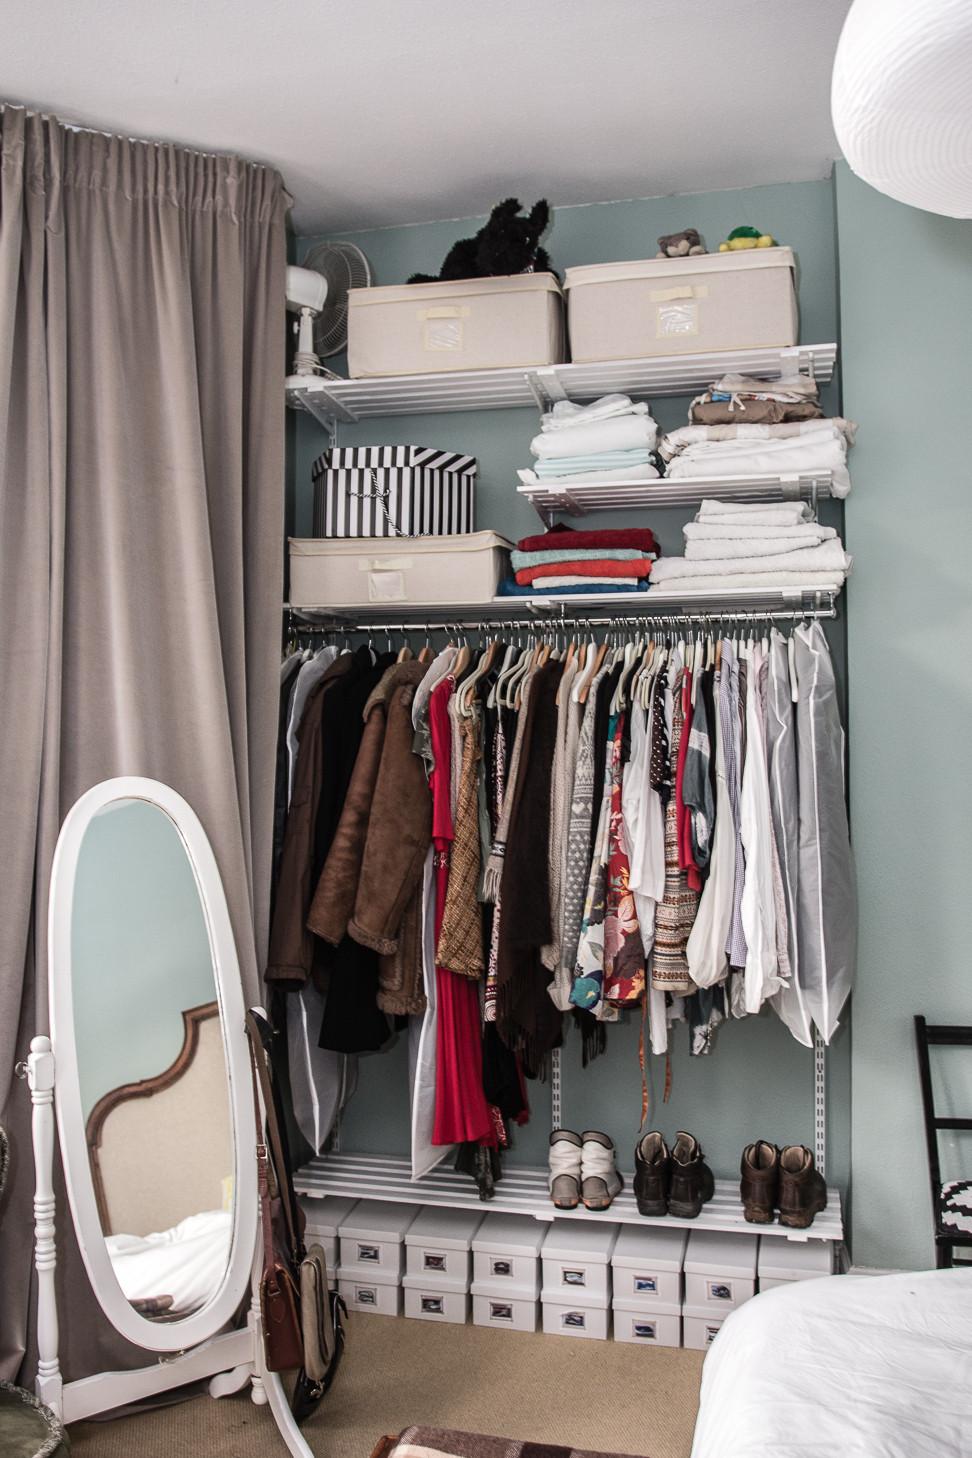 Diy Wardrobe  13 DIY Wardrobe Ideas to Consider Trying